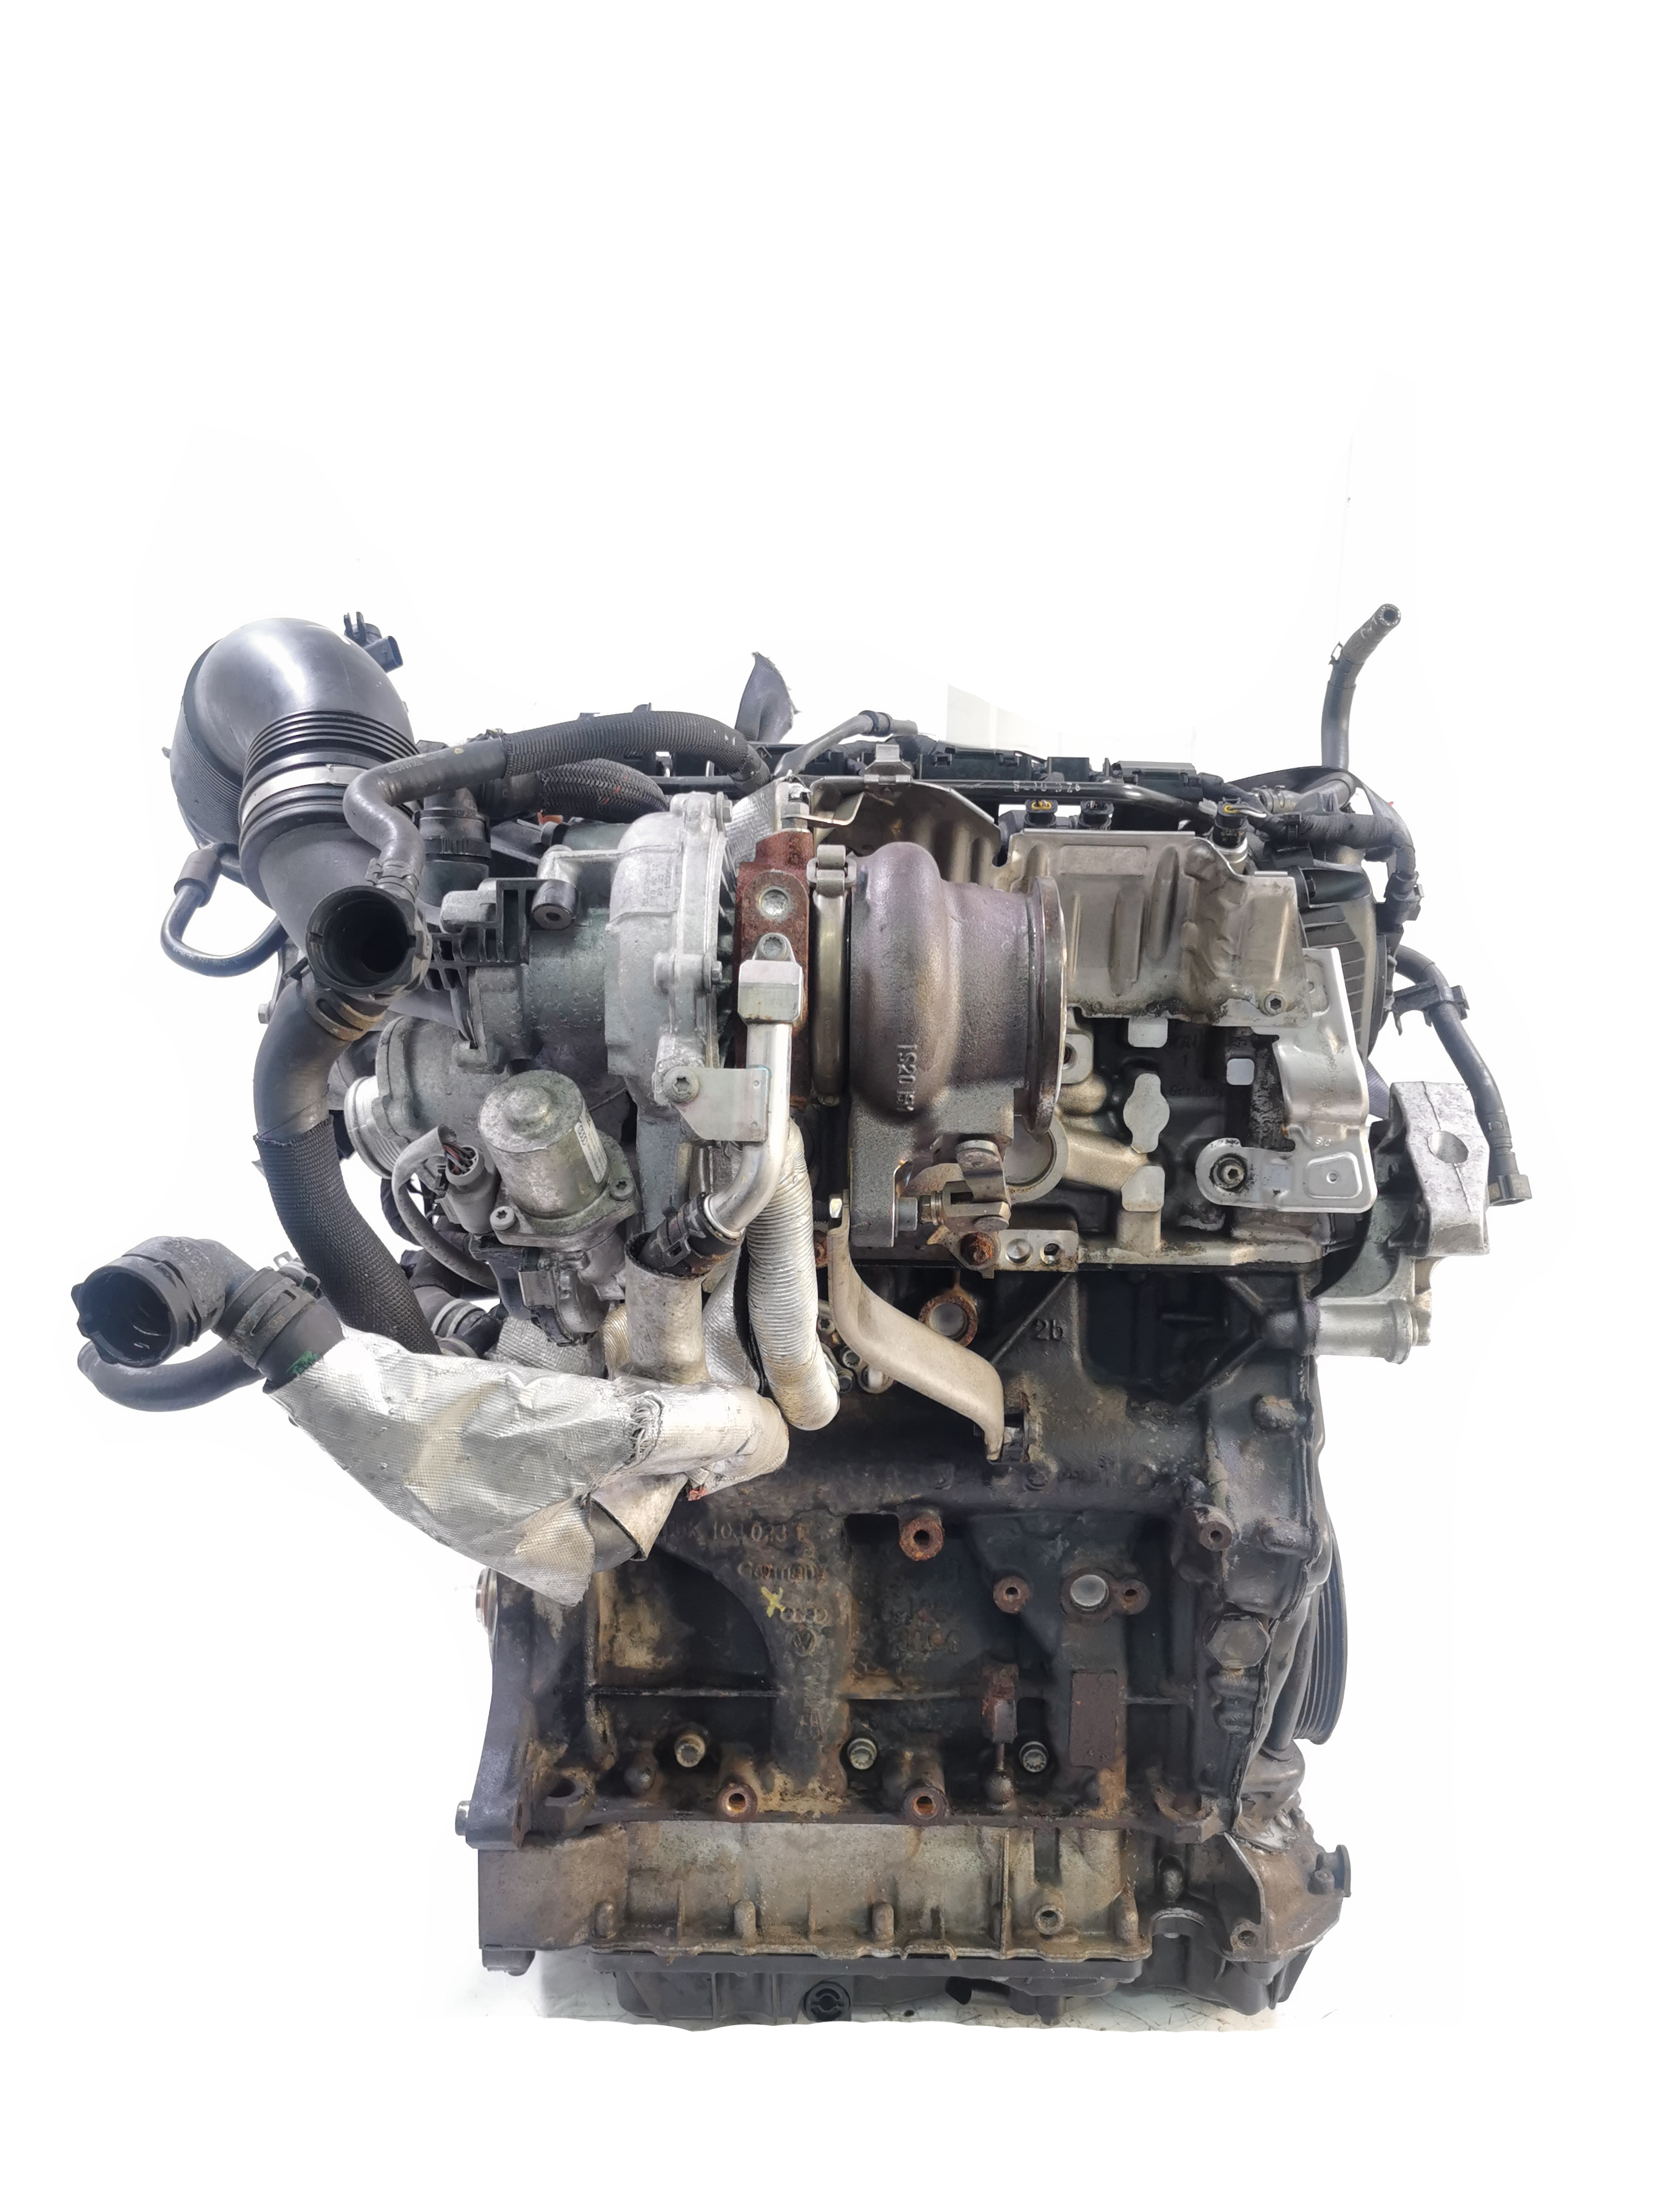 Motor mit Anbauteilen 2013 VW Skoda Golf GTI Octavia 2,0 TSI TFSI CHH CHHB